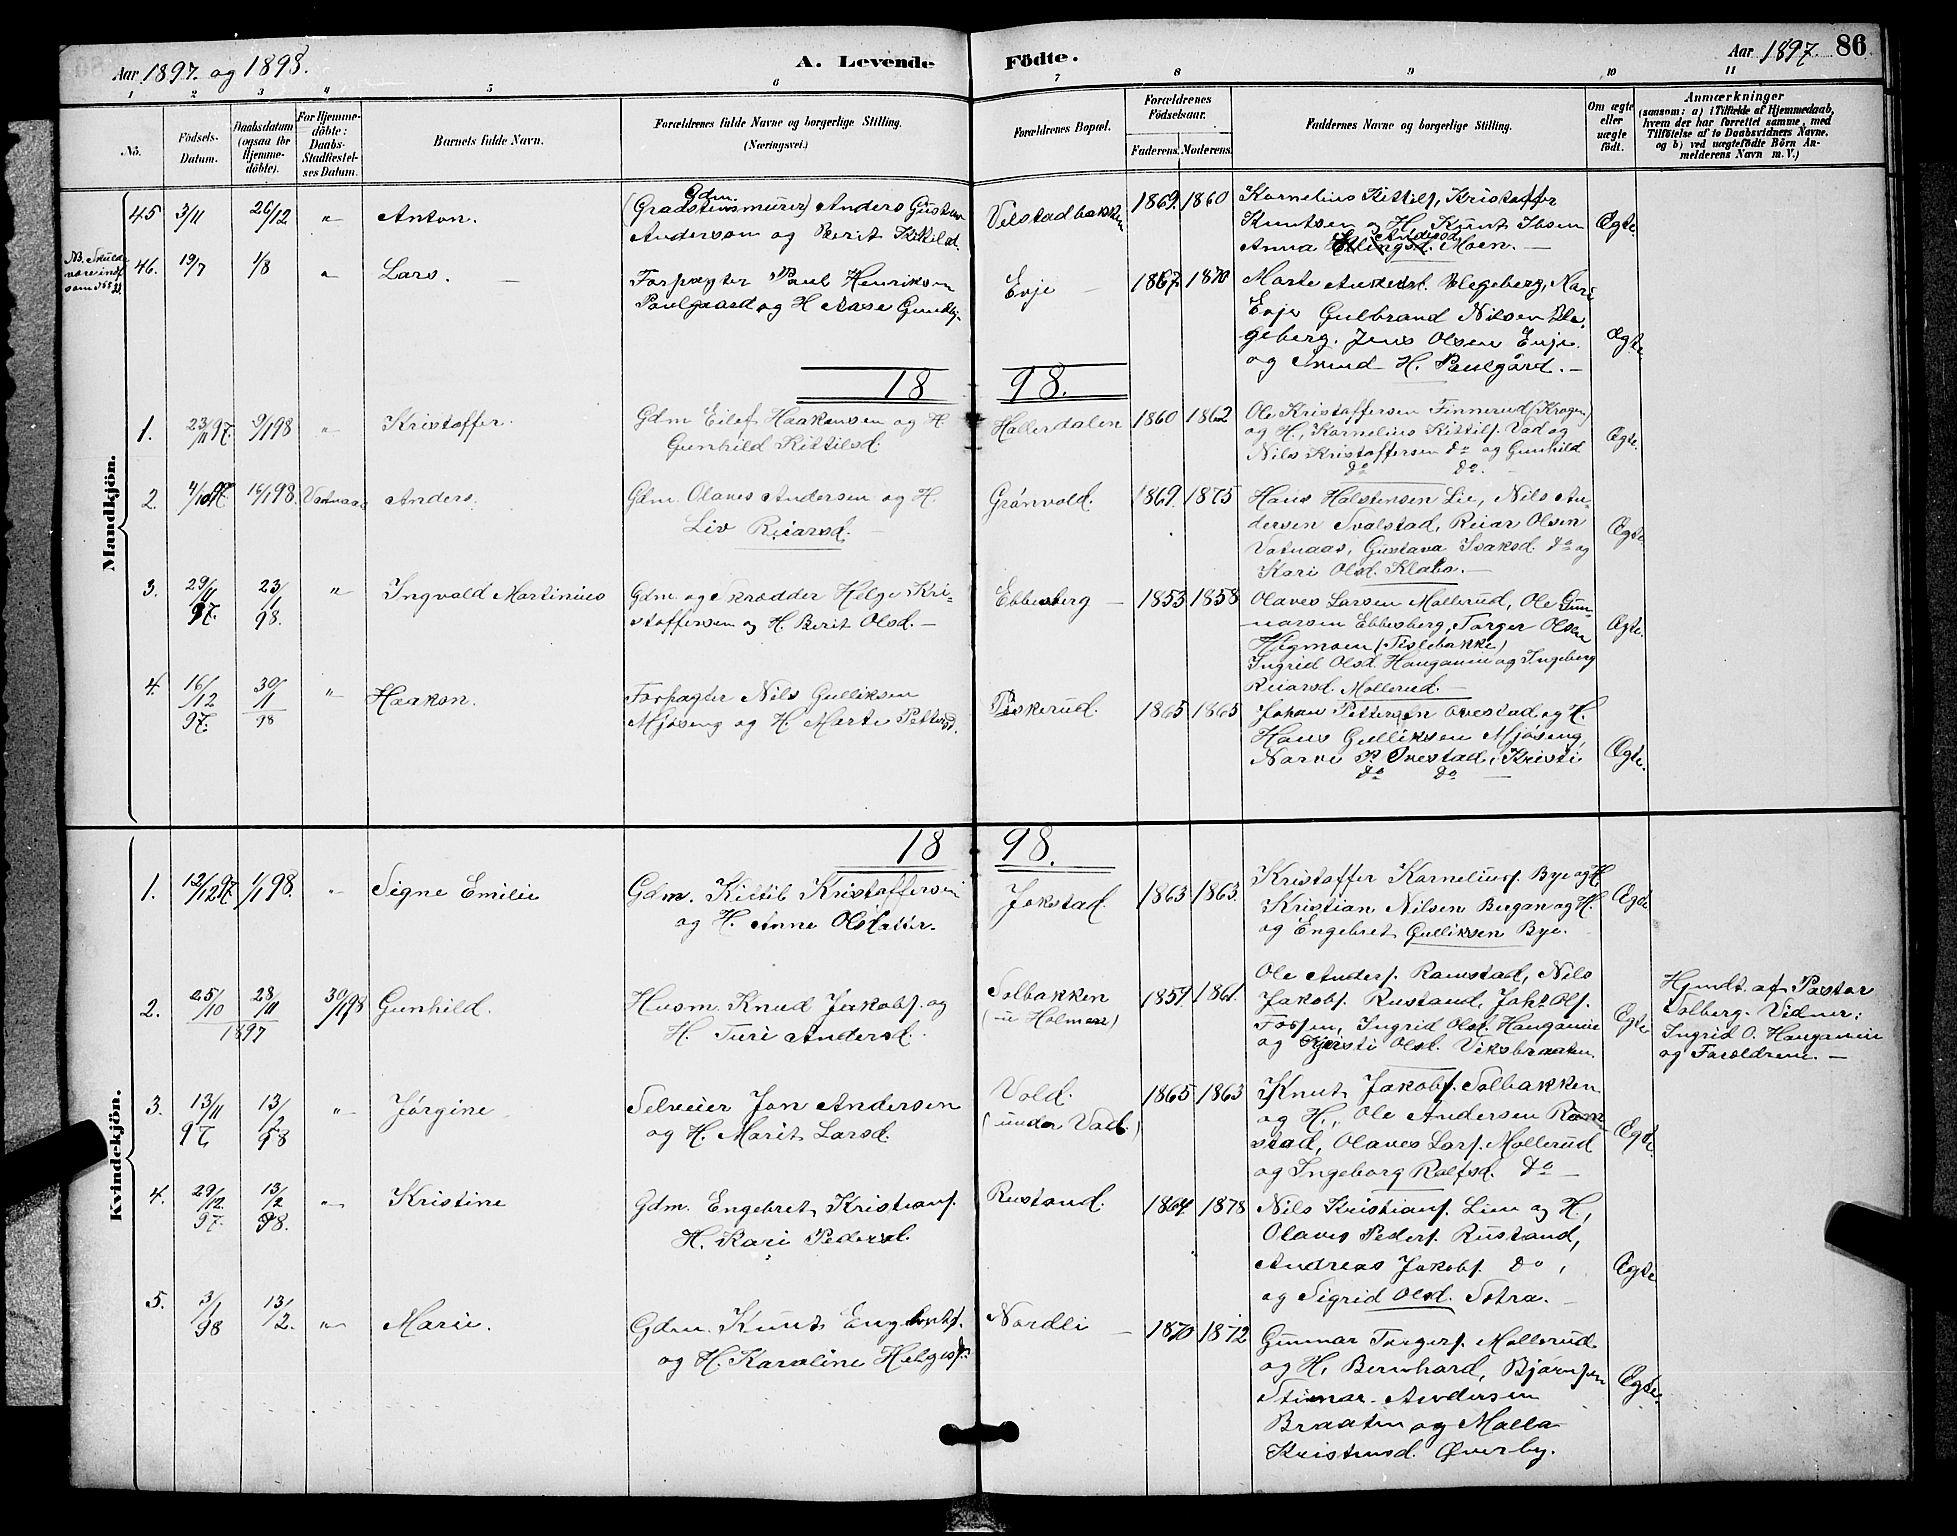 SAKO, Sigdal kirkebøker, G/Ga/L0005: Klokkerbok nr. I 5, 1886-1900, s. 86